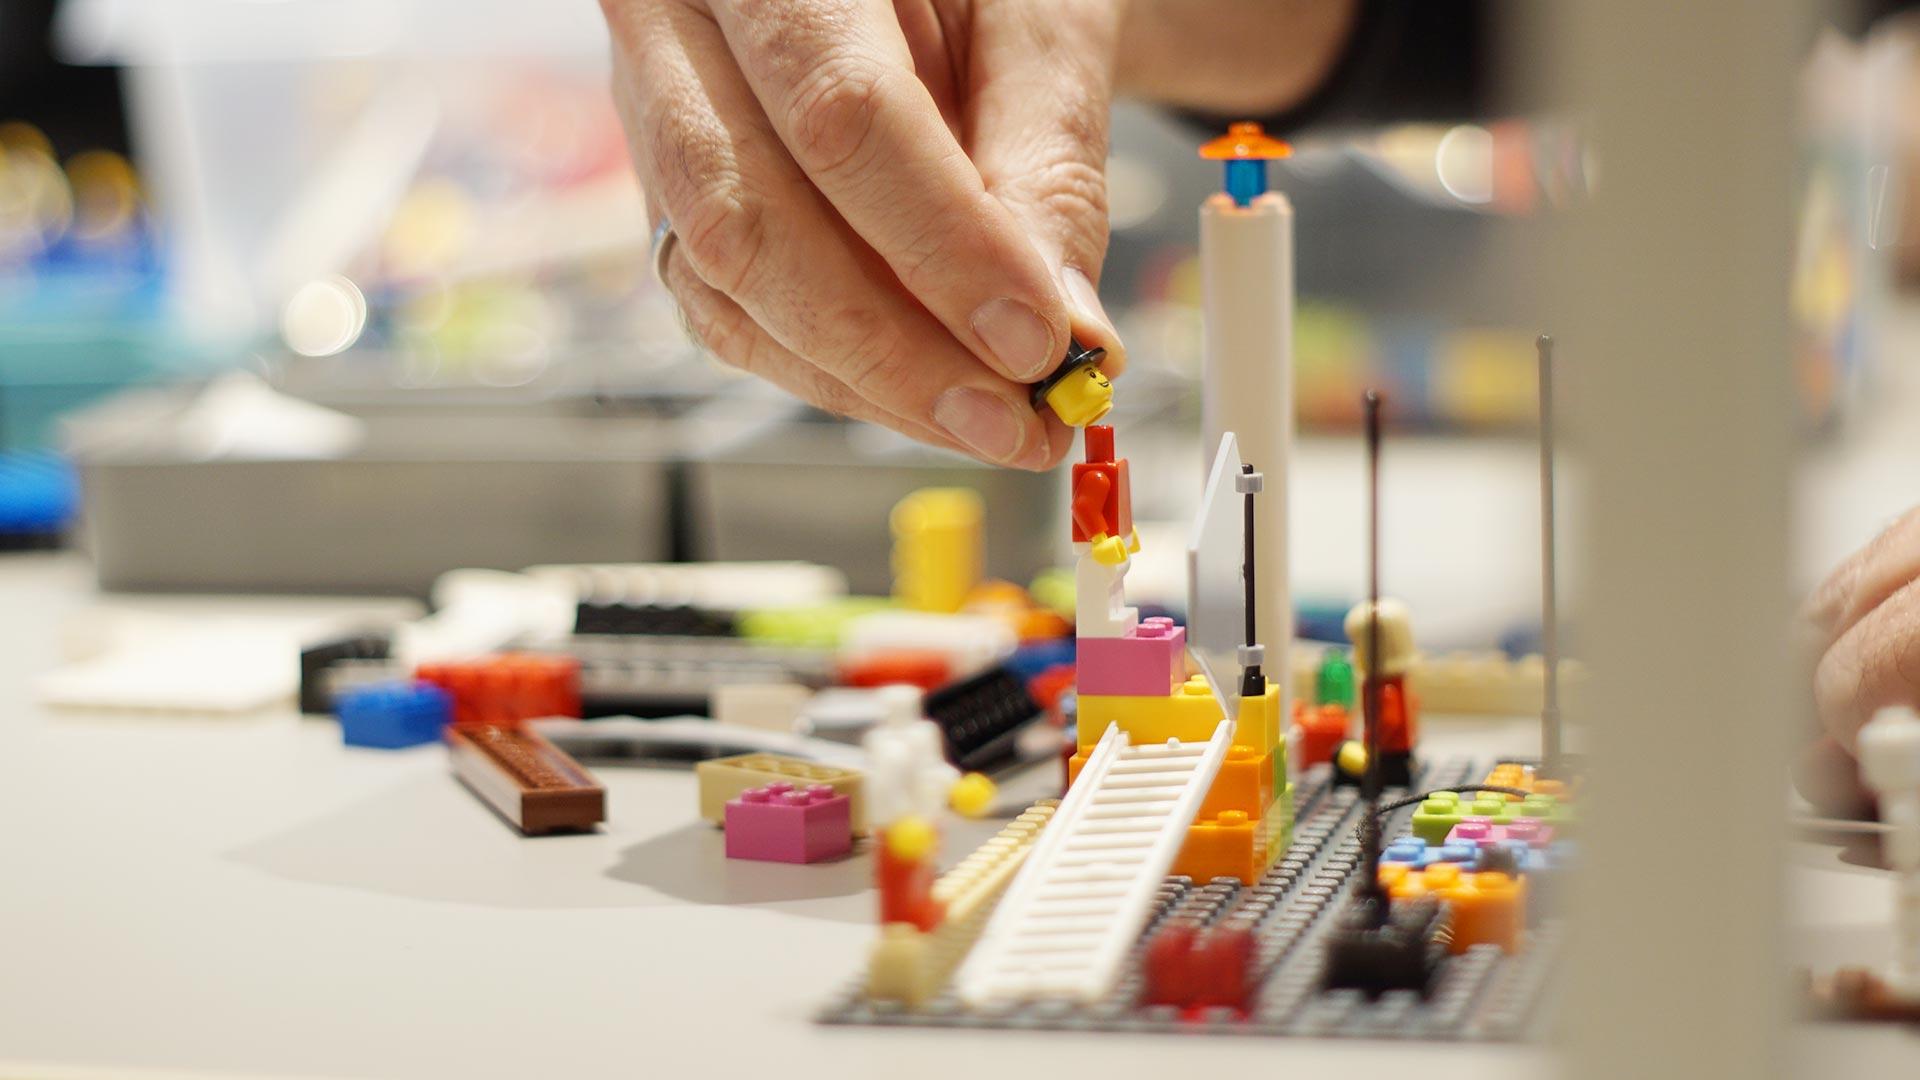 Man building lego